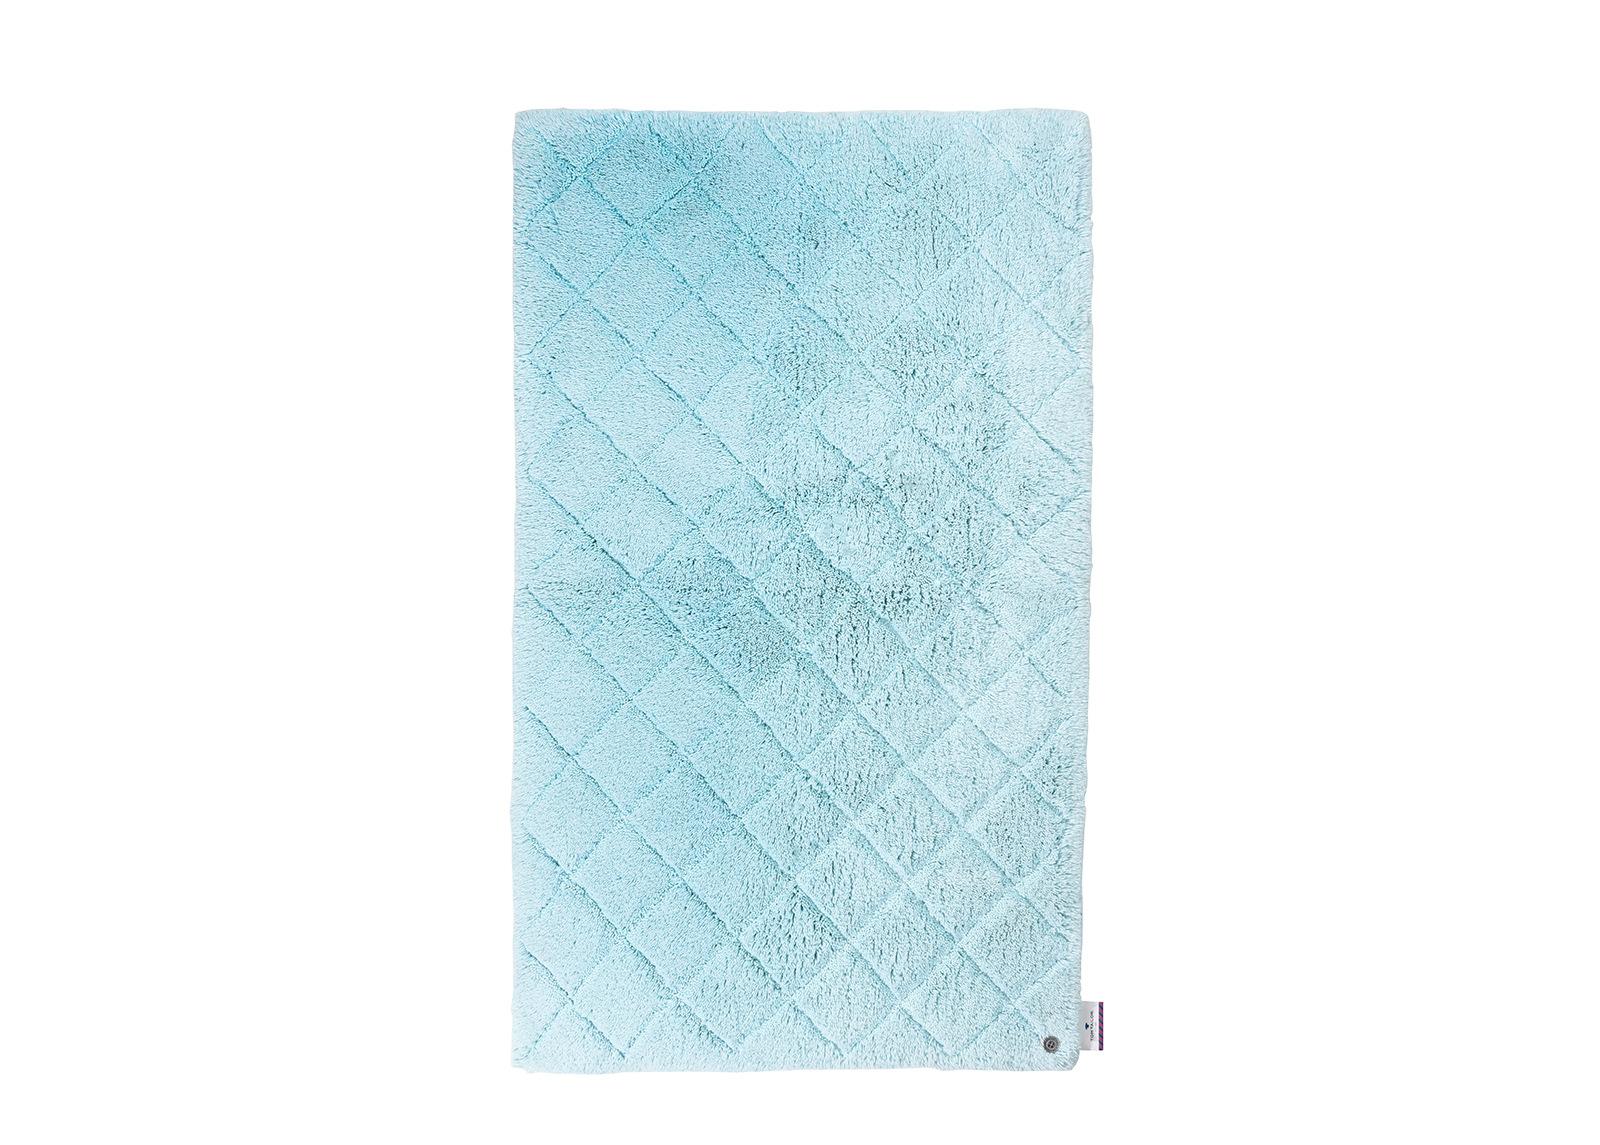 Kylpyhuoneen matto Cotton Pattern 60x60 cm